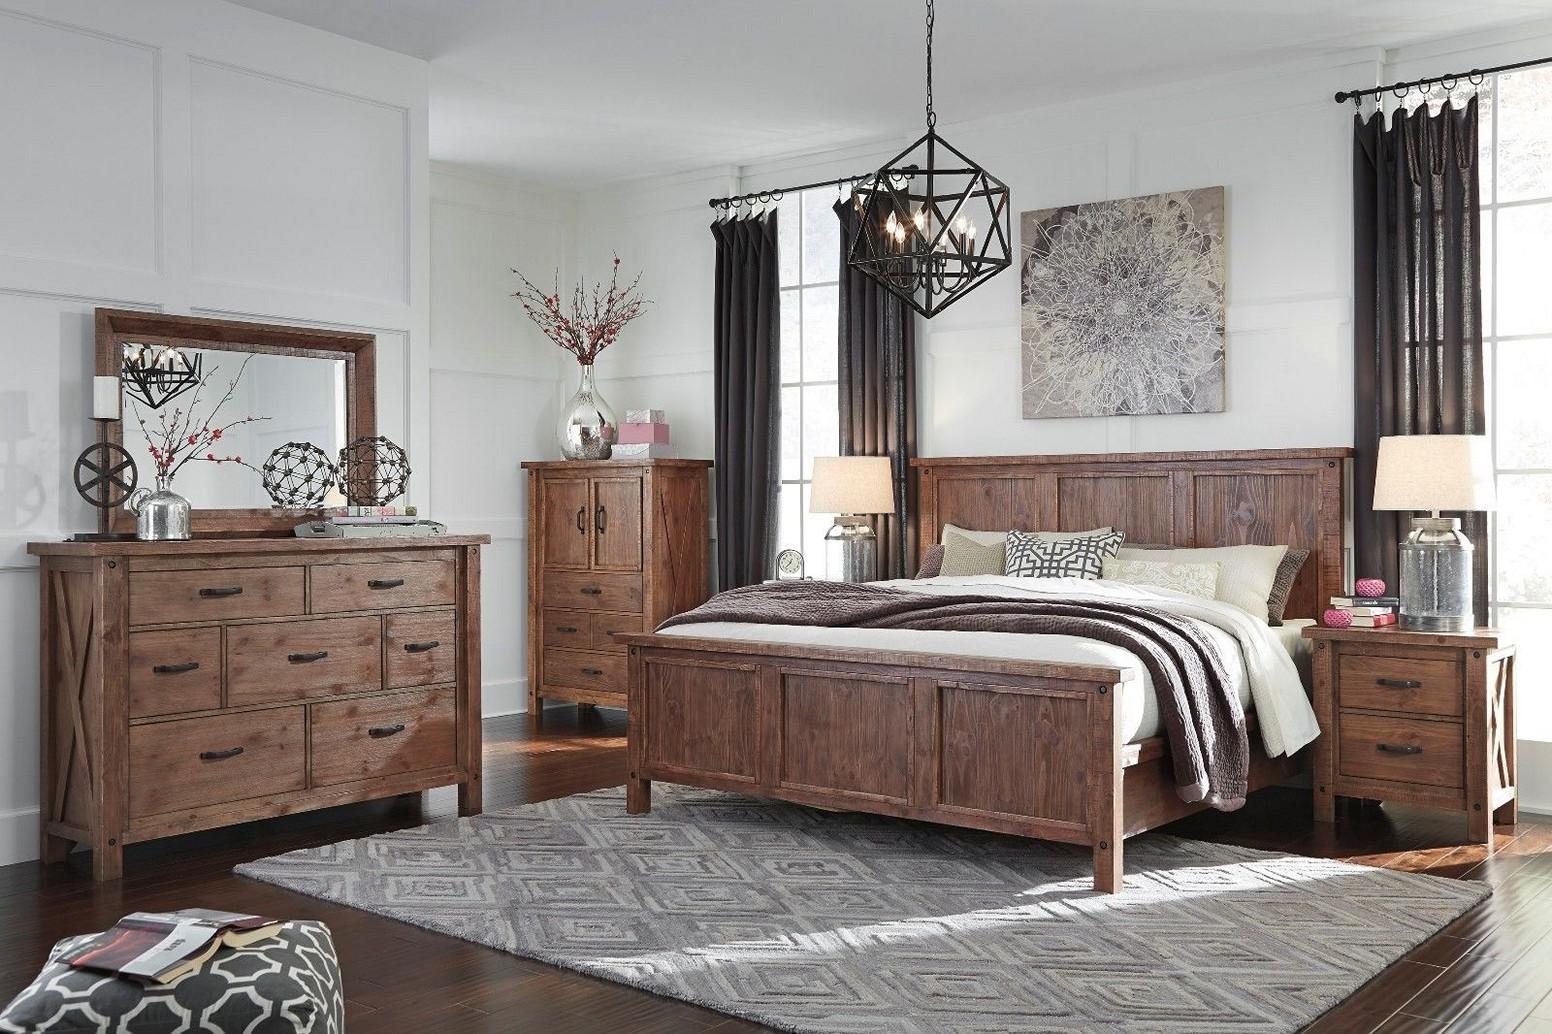 vintage bedroom furniture vintage bedroom wood OZMAKHK